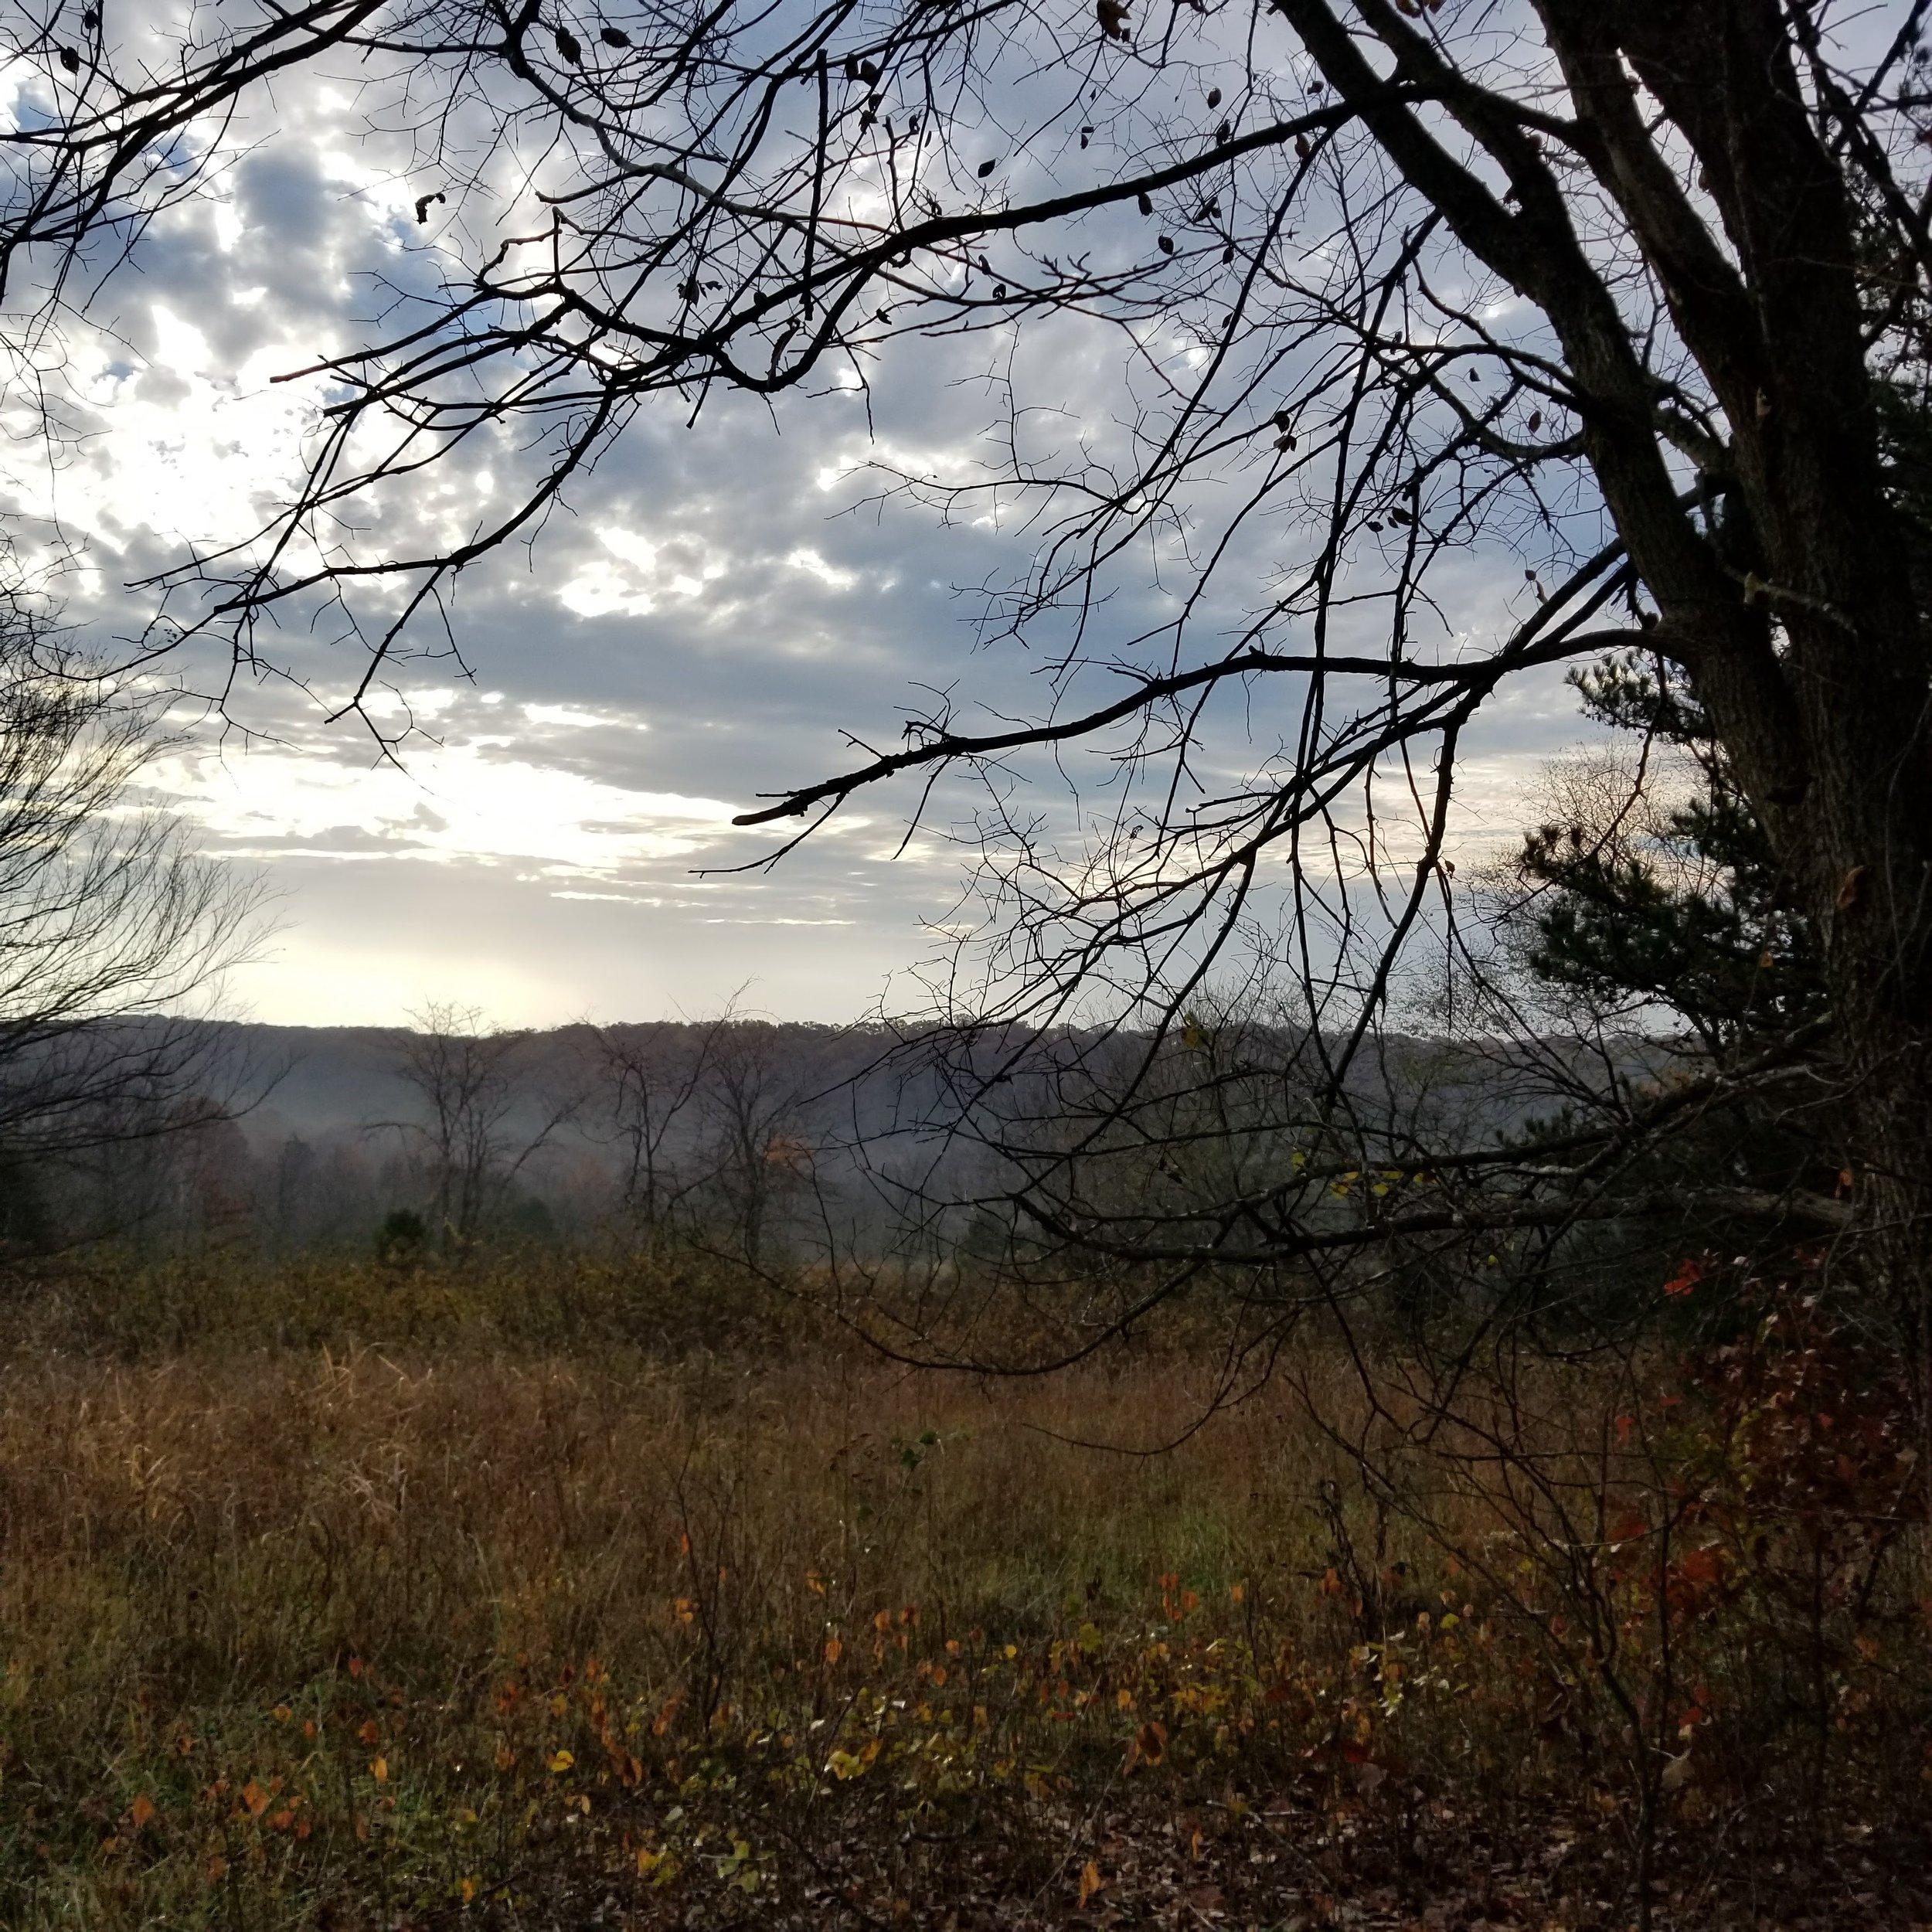 Morning hike from Bar K Camp (Mark Twain National Park)